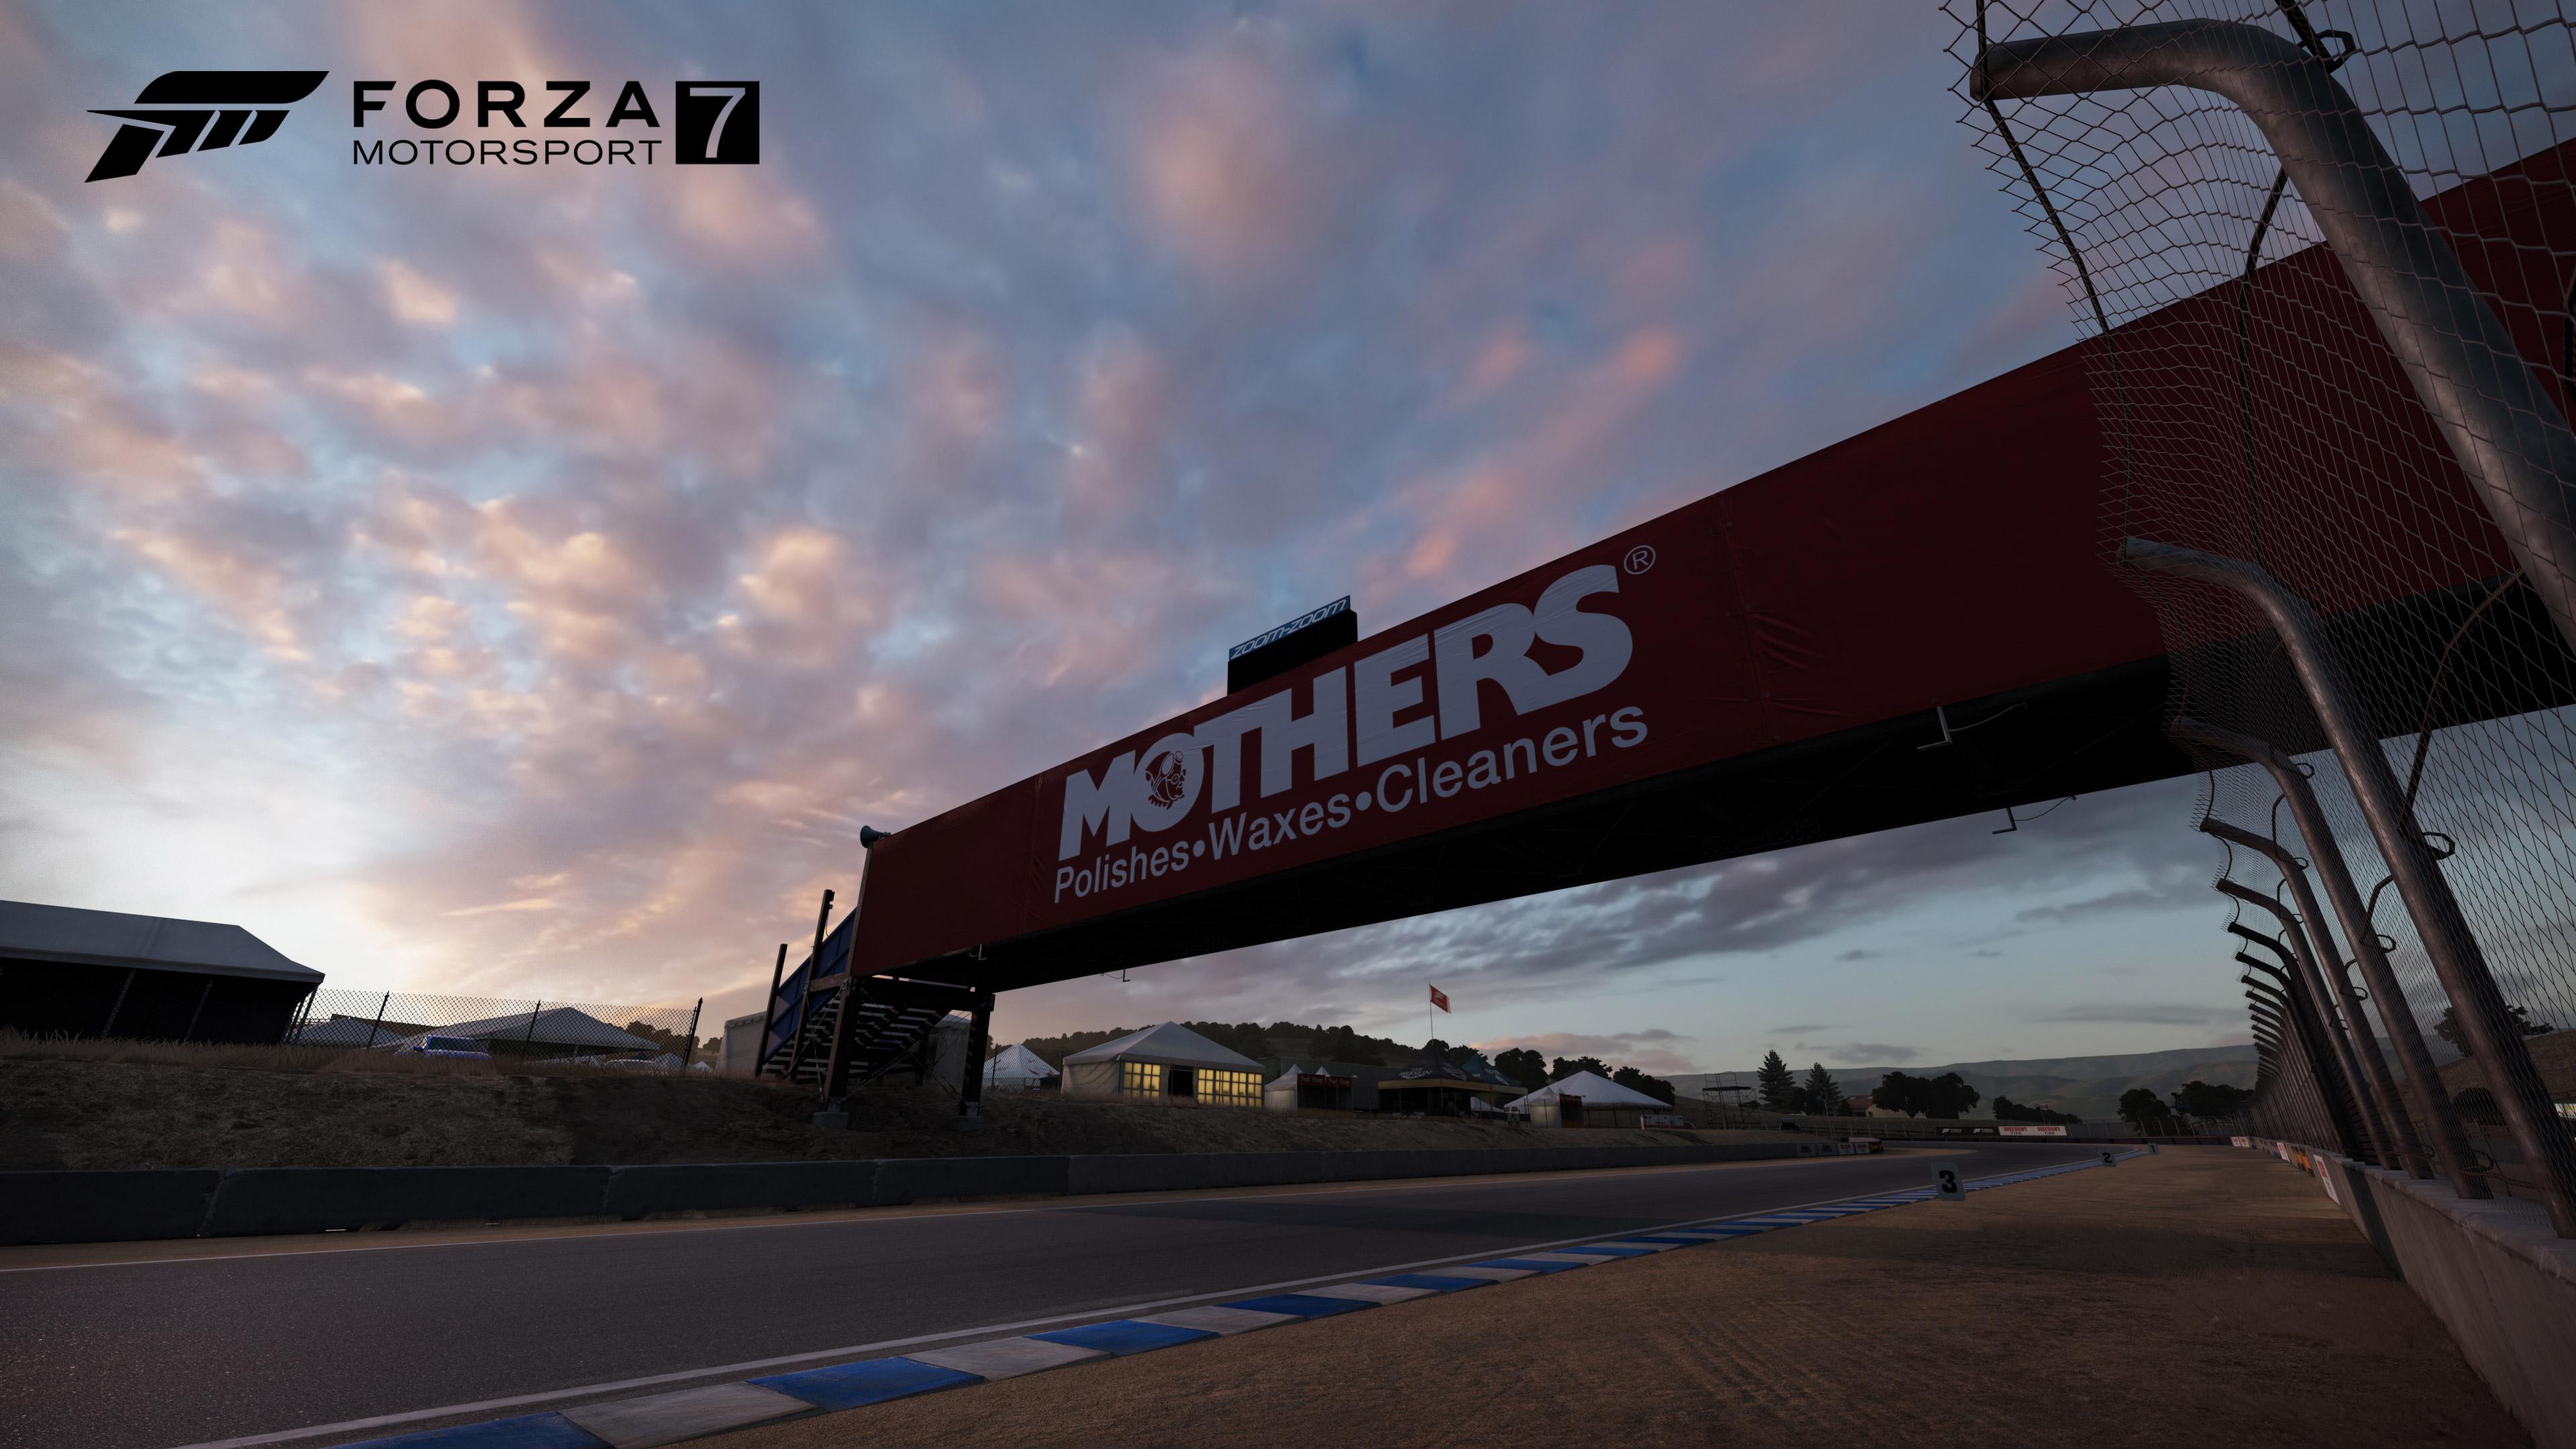 Mazda Raceway Laguna Seca >> Forza Motorsport 7 : liste des 32 circuits et images humides | Xbox One - Xboxygen